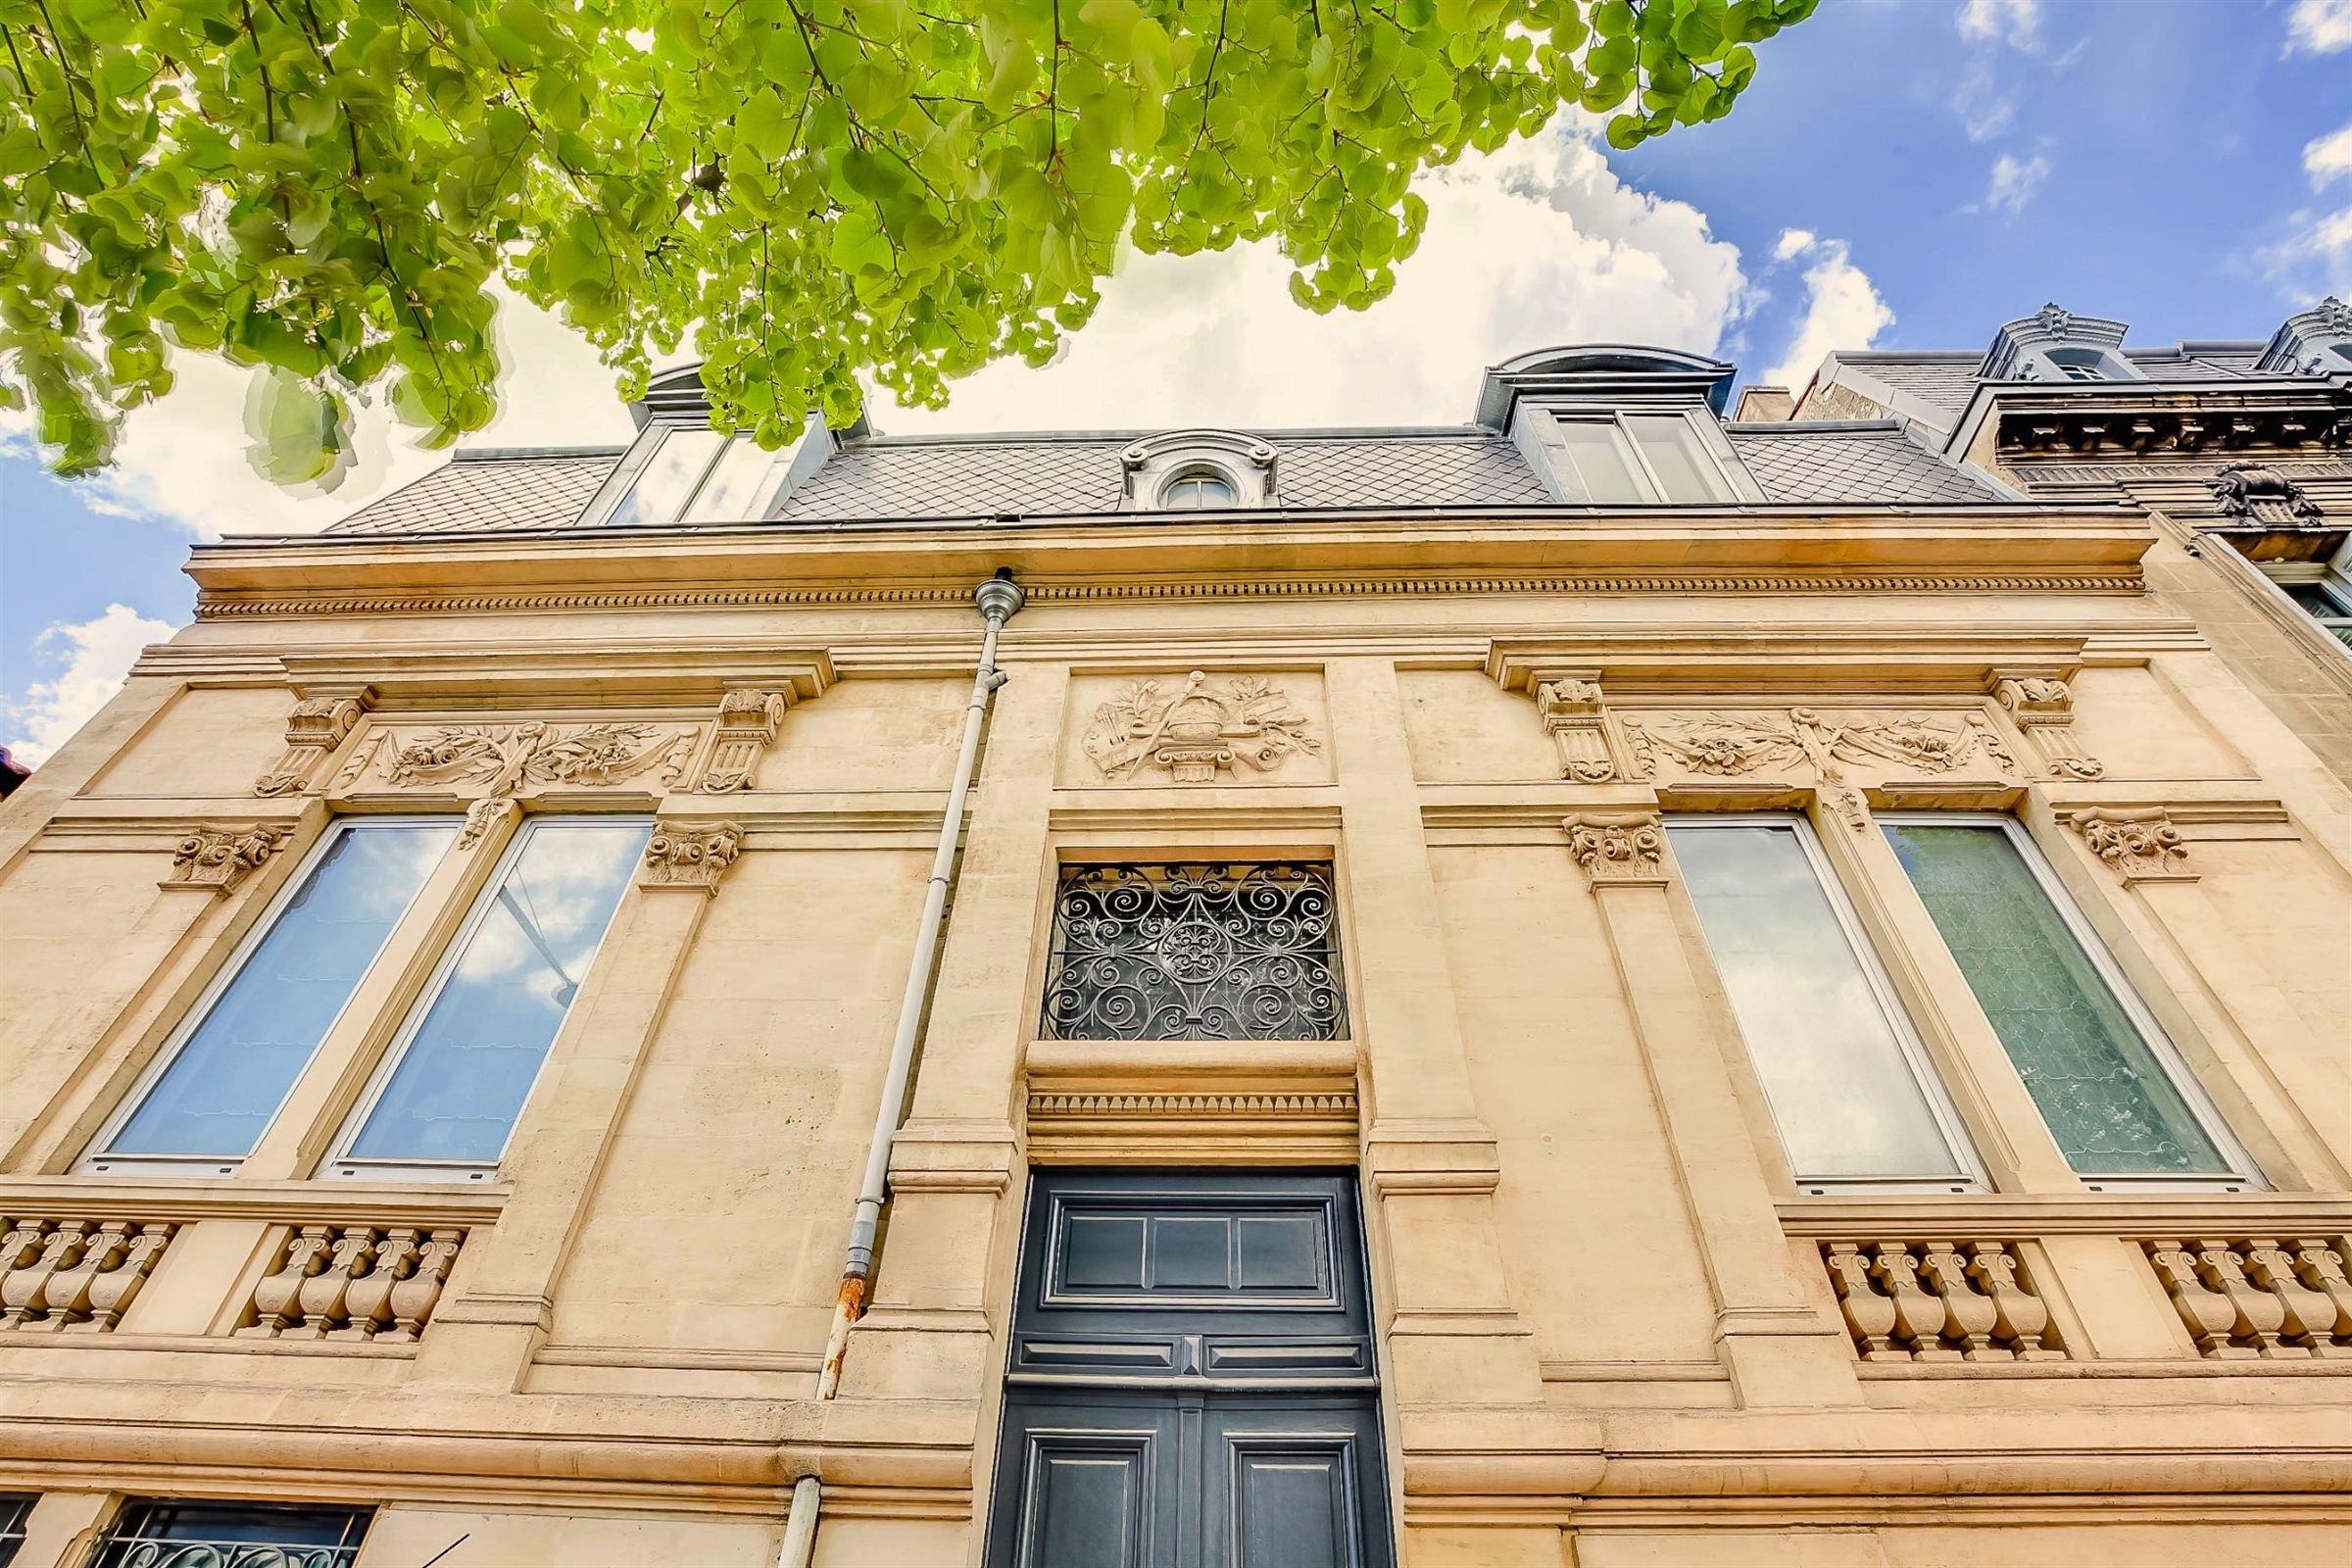 Einfamilienhaus für Verkauf beim DOWNTOWN BORDEAUX - GORGEOUS TOWN-HOUSE - SPA - PARKING Bordeaux, Aquitanien, 33000 Frankreich